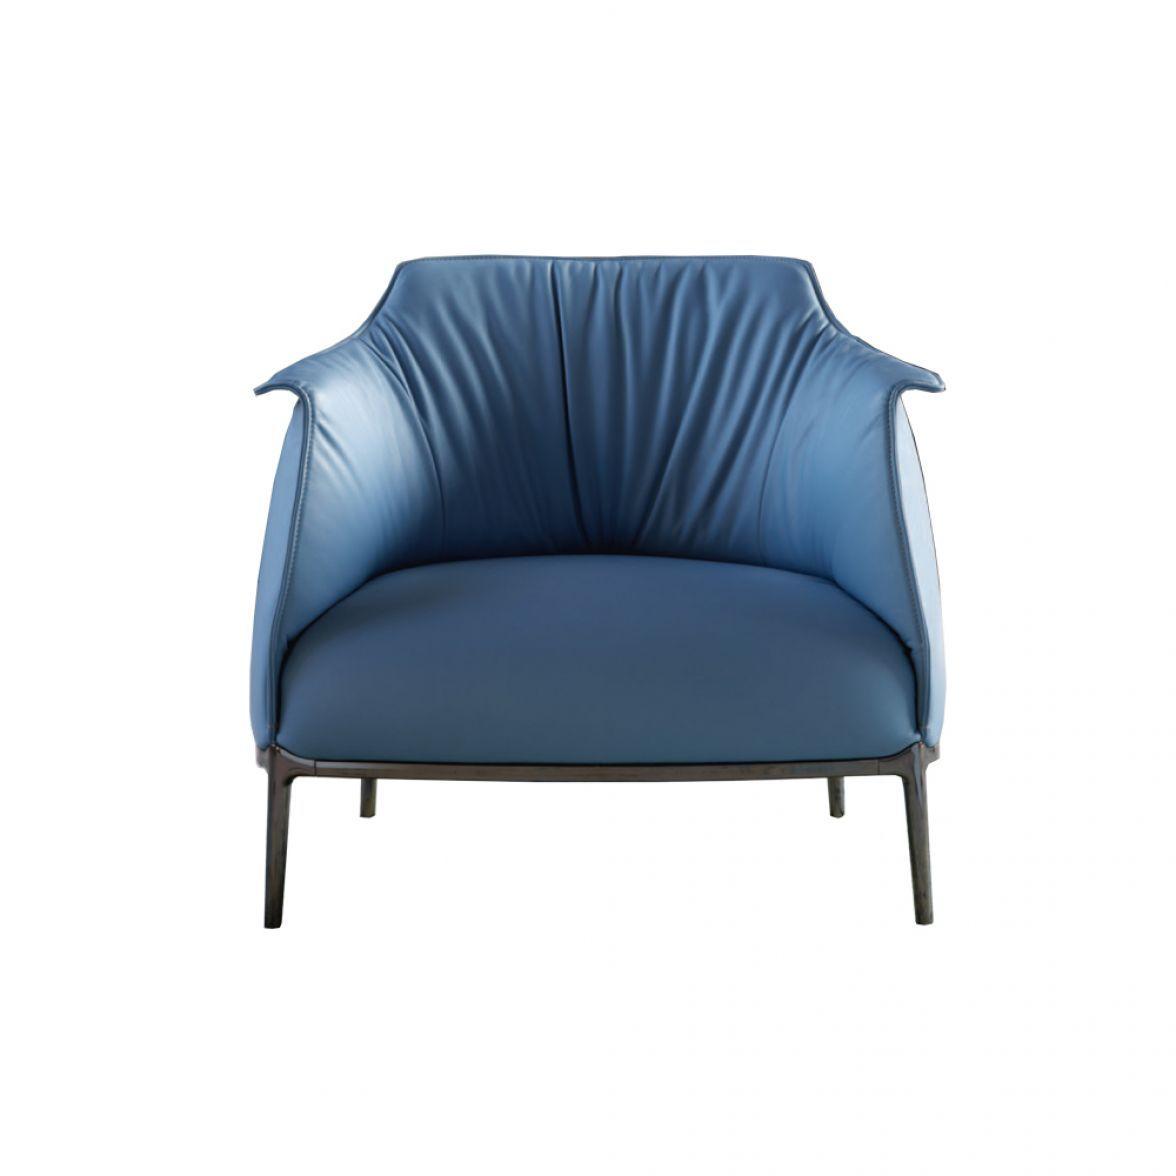 Кресло Archibald фото цена